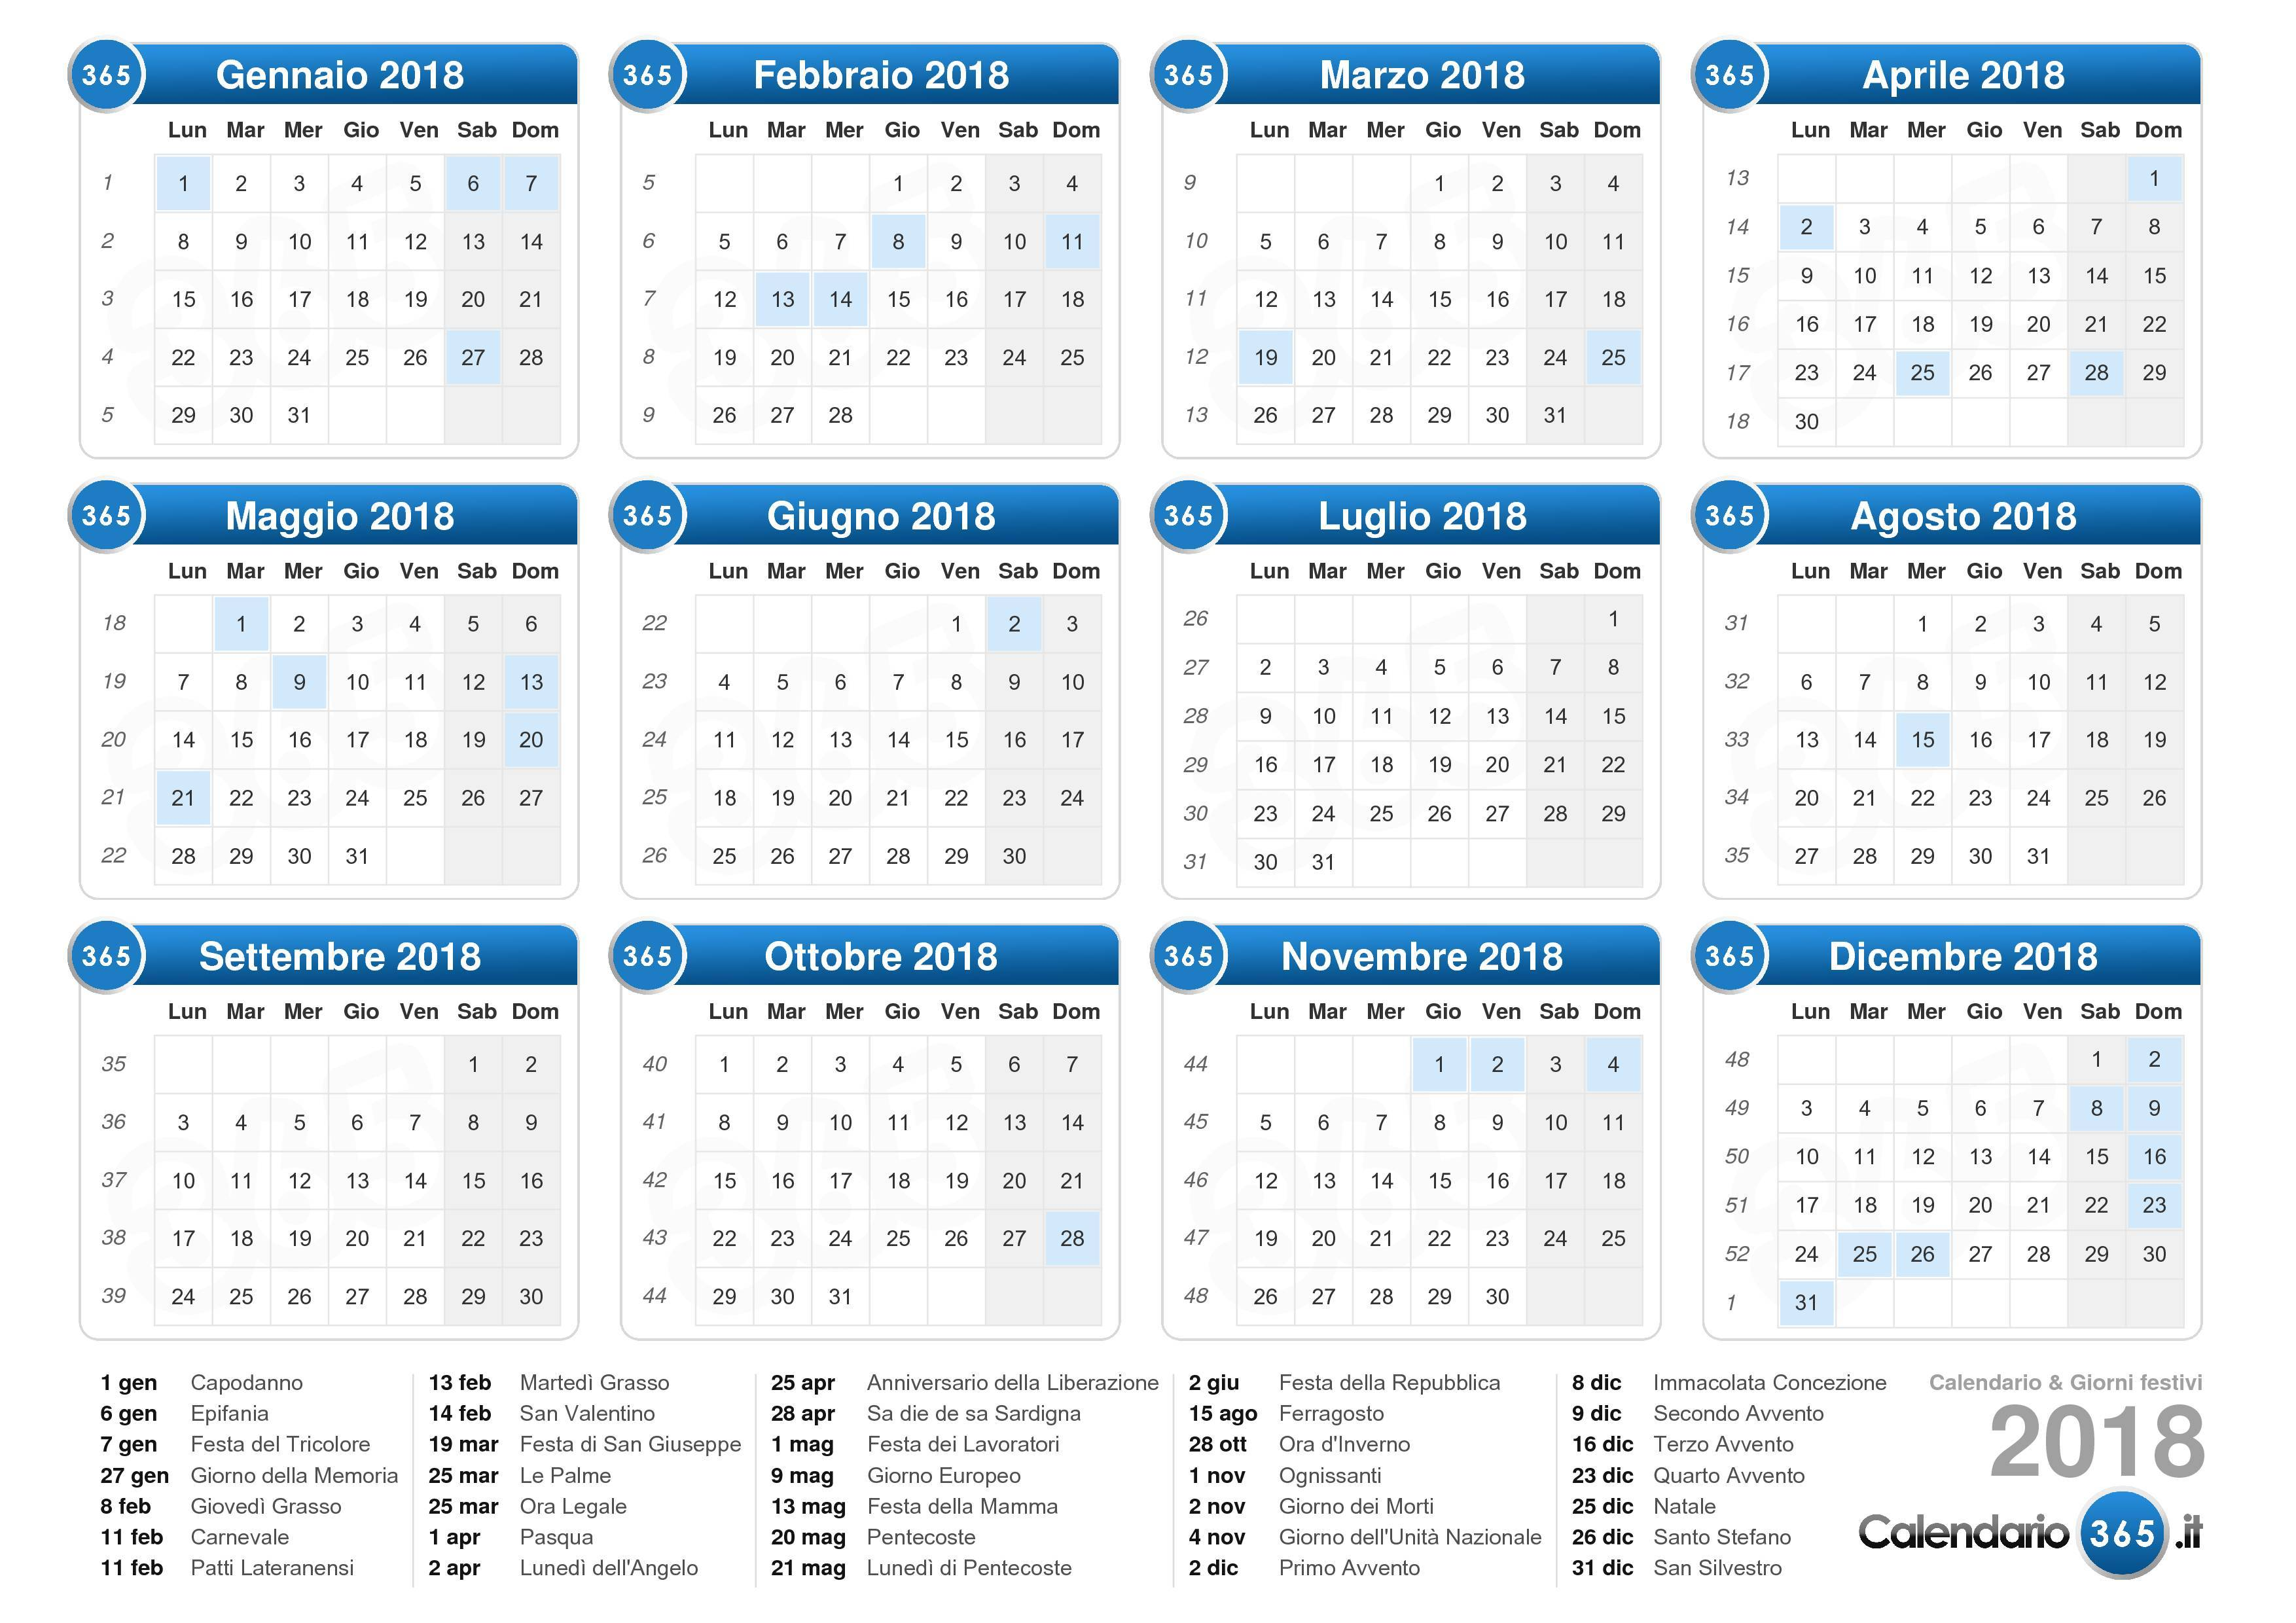 Calendario Solo Numeri.Calendario 2018